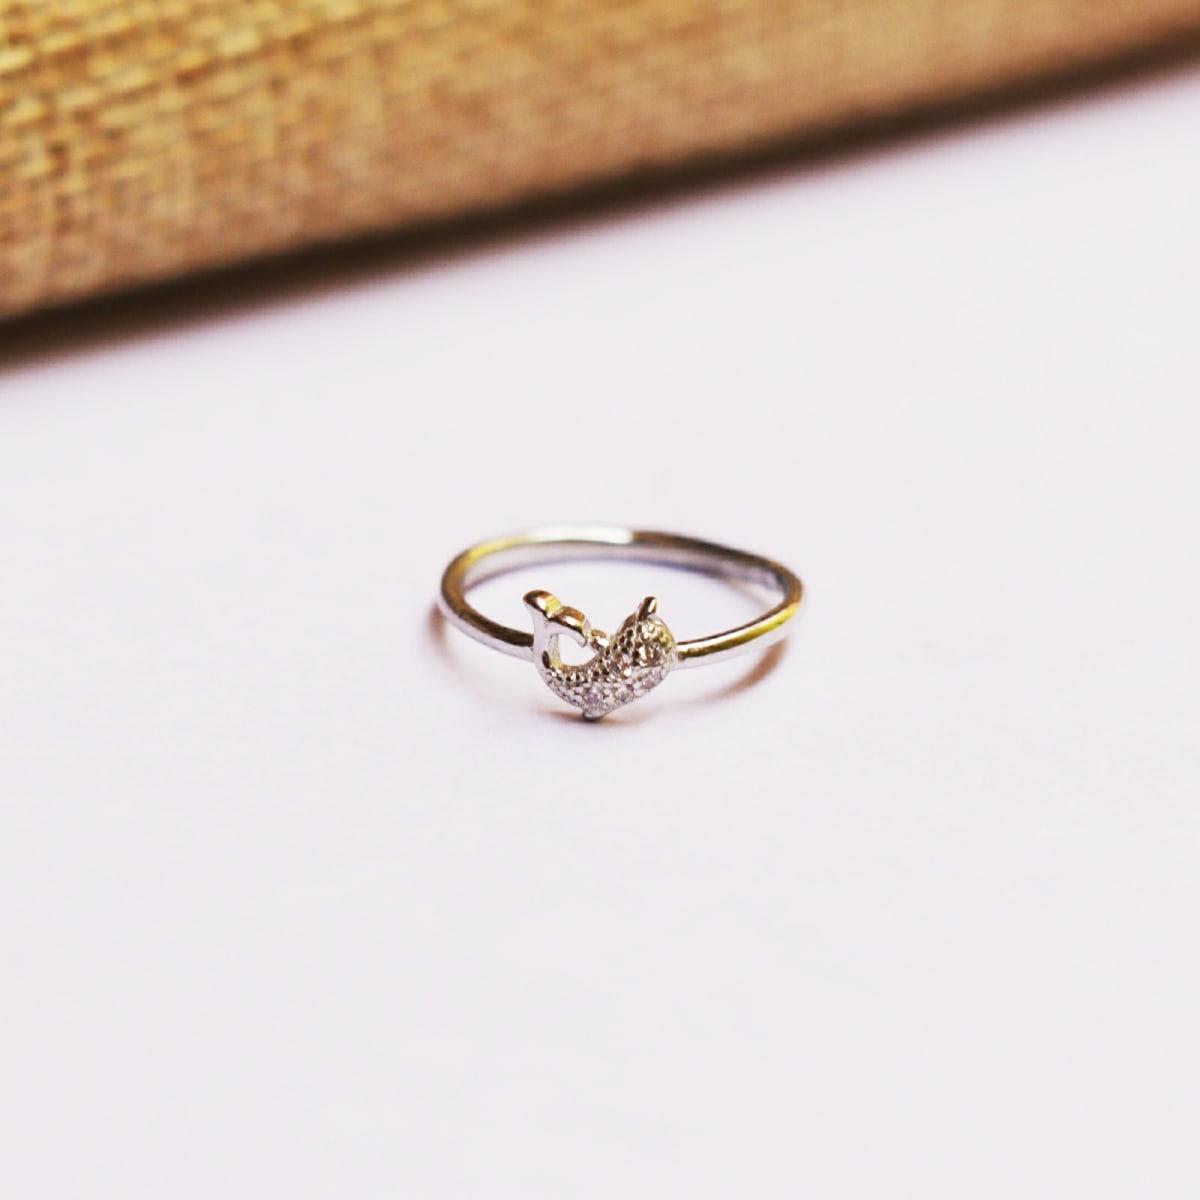 925 Silver Fish  Ring